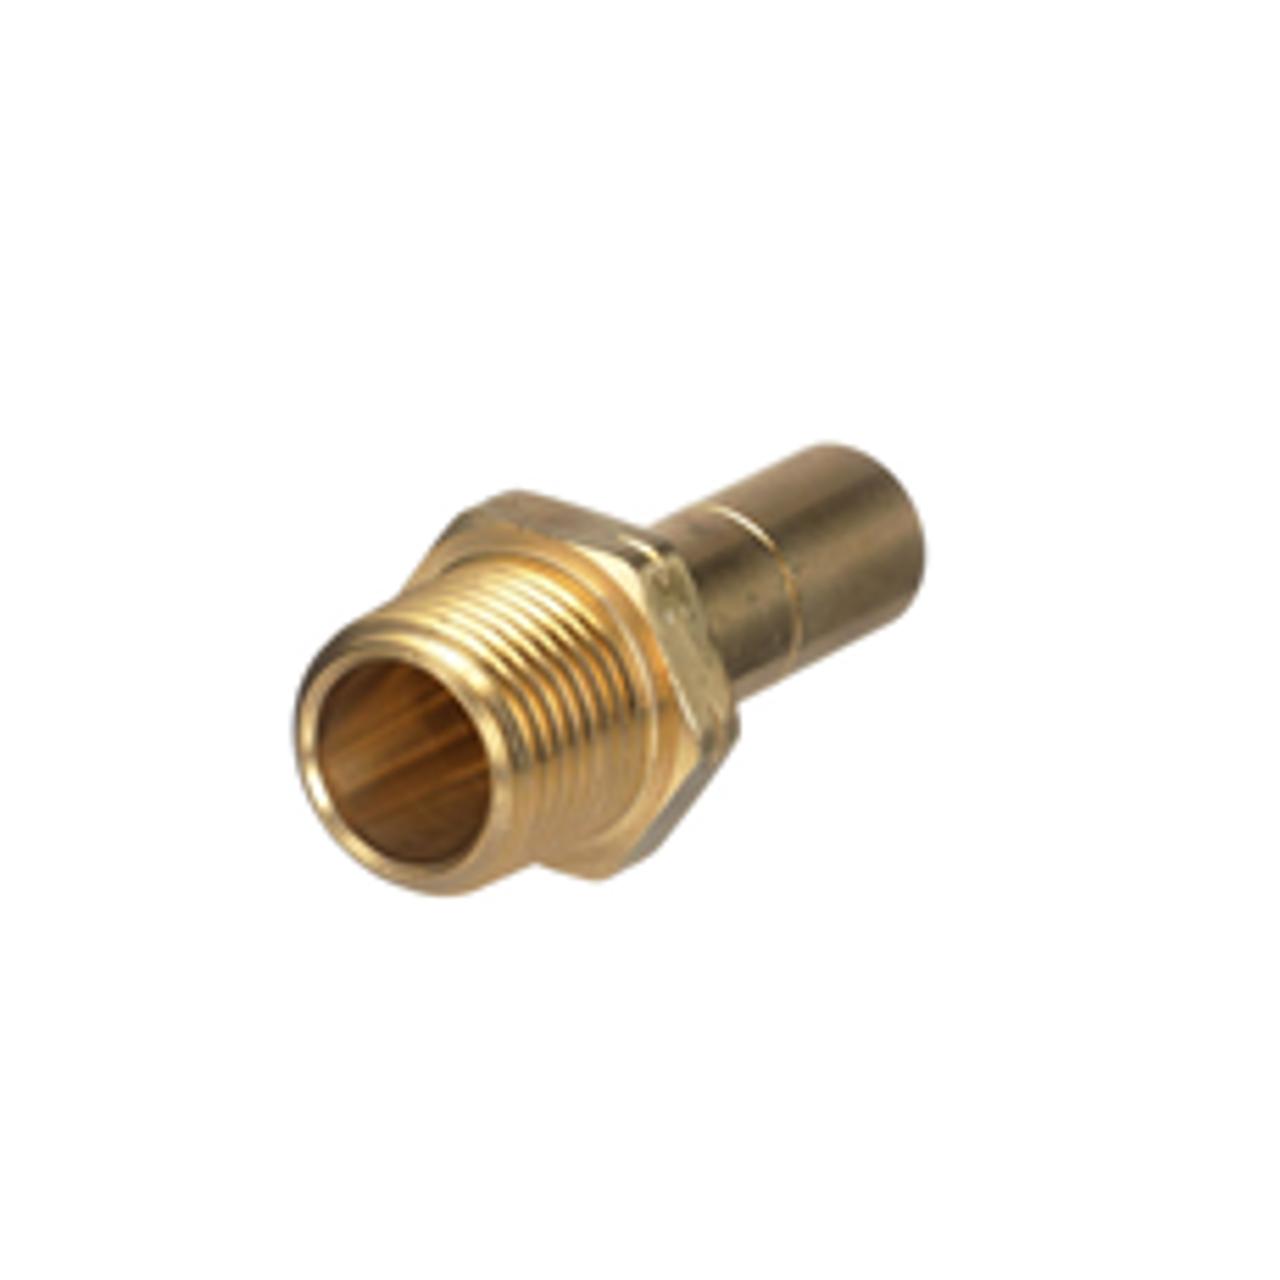 "15mm x ½"" NPT Brass Stem Adapter 1229-0815"